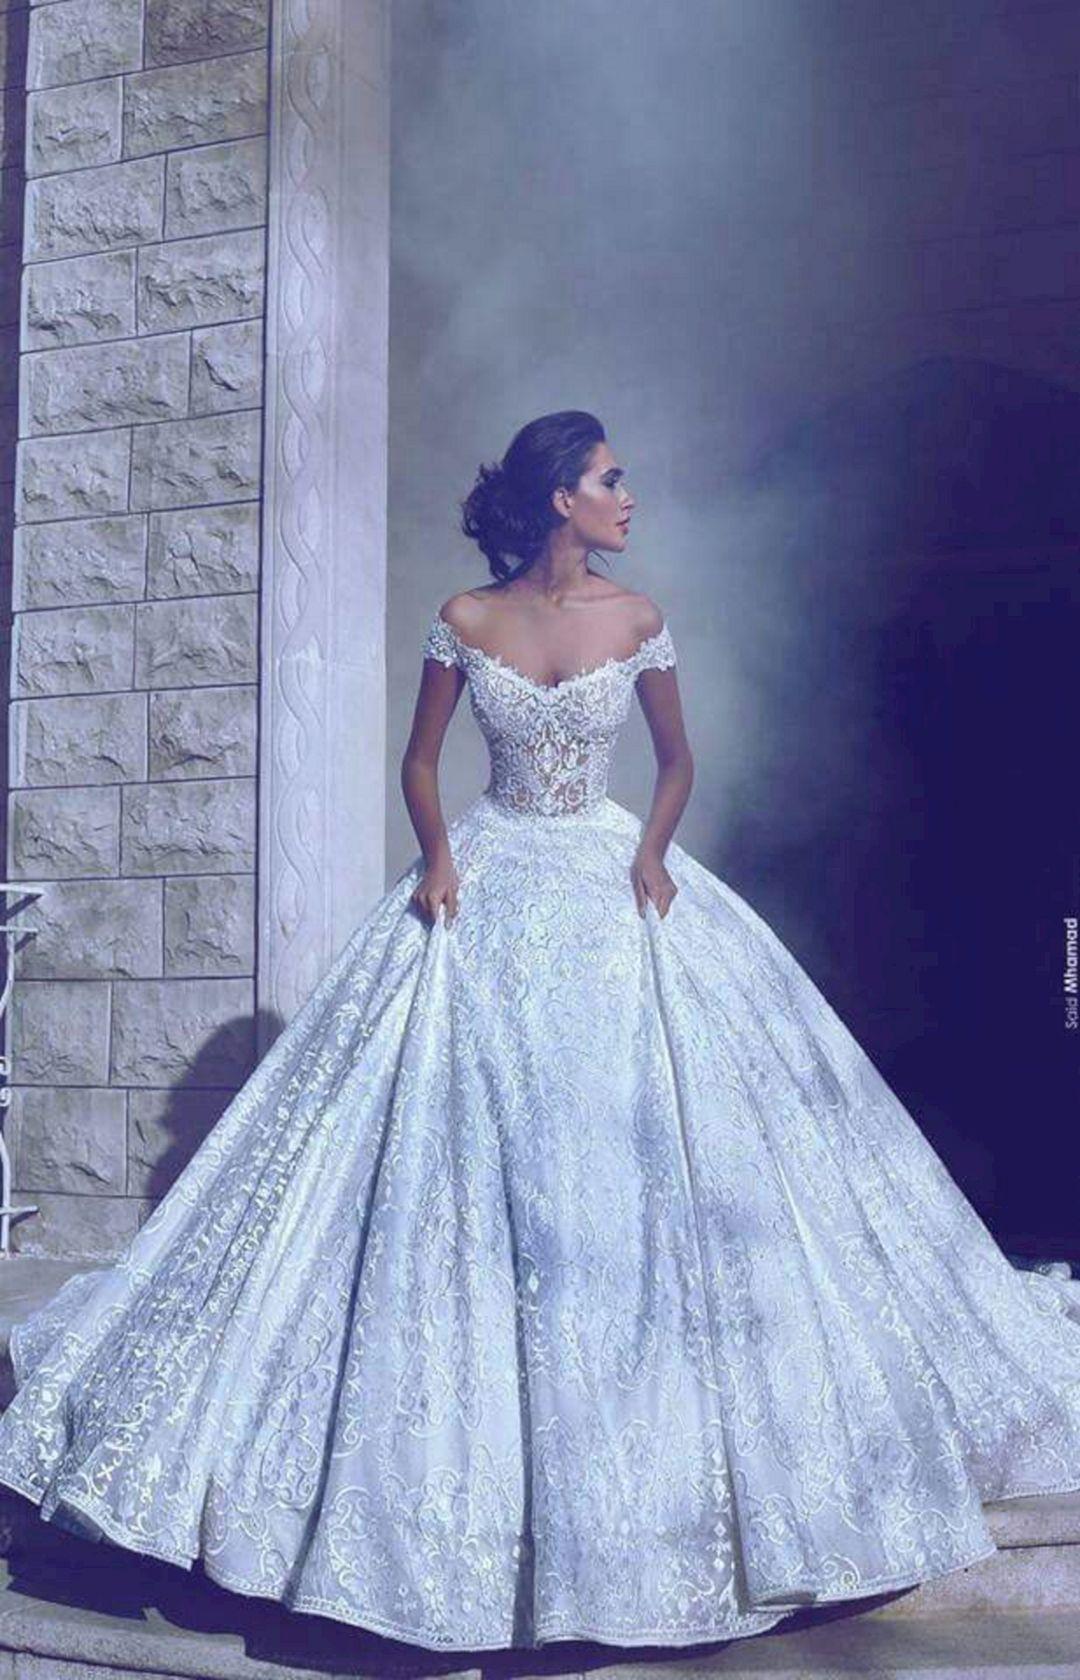 40 Beautiful Princess Wedding Dress Ideas For Perfect Bride Wedding Dresses Bridal Dresses Dream Wedding Dresses [ 1680 x 1080 Pixel ]